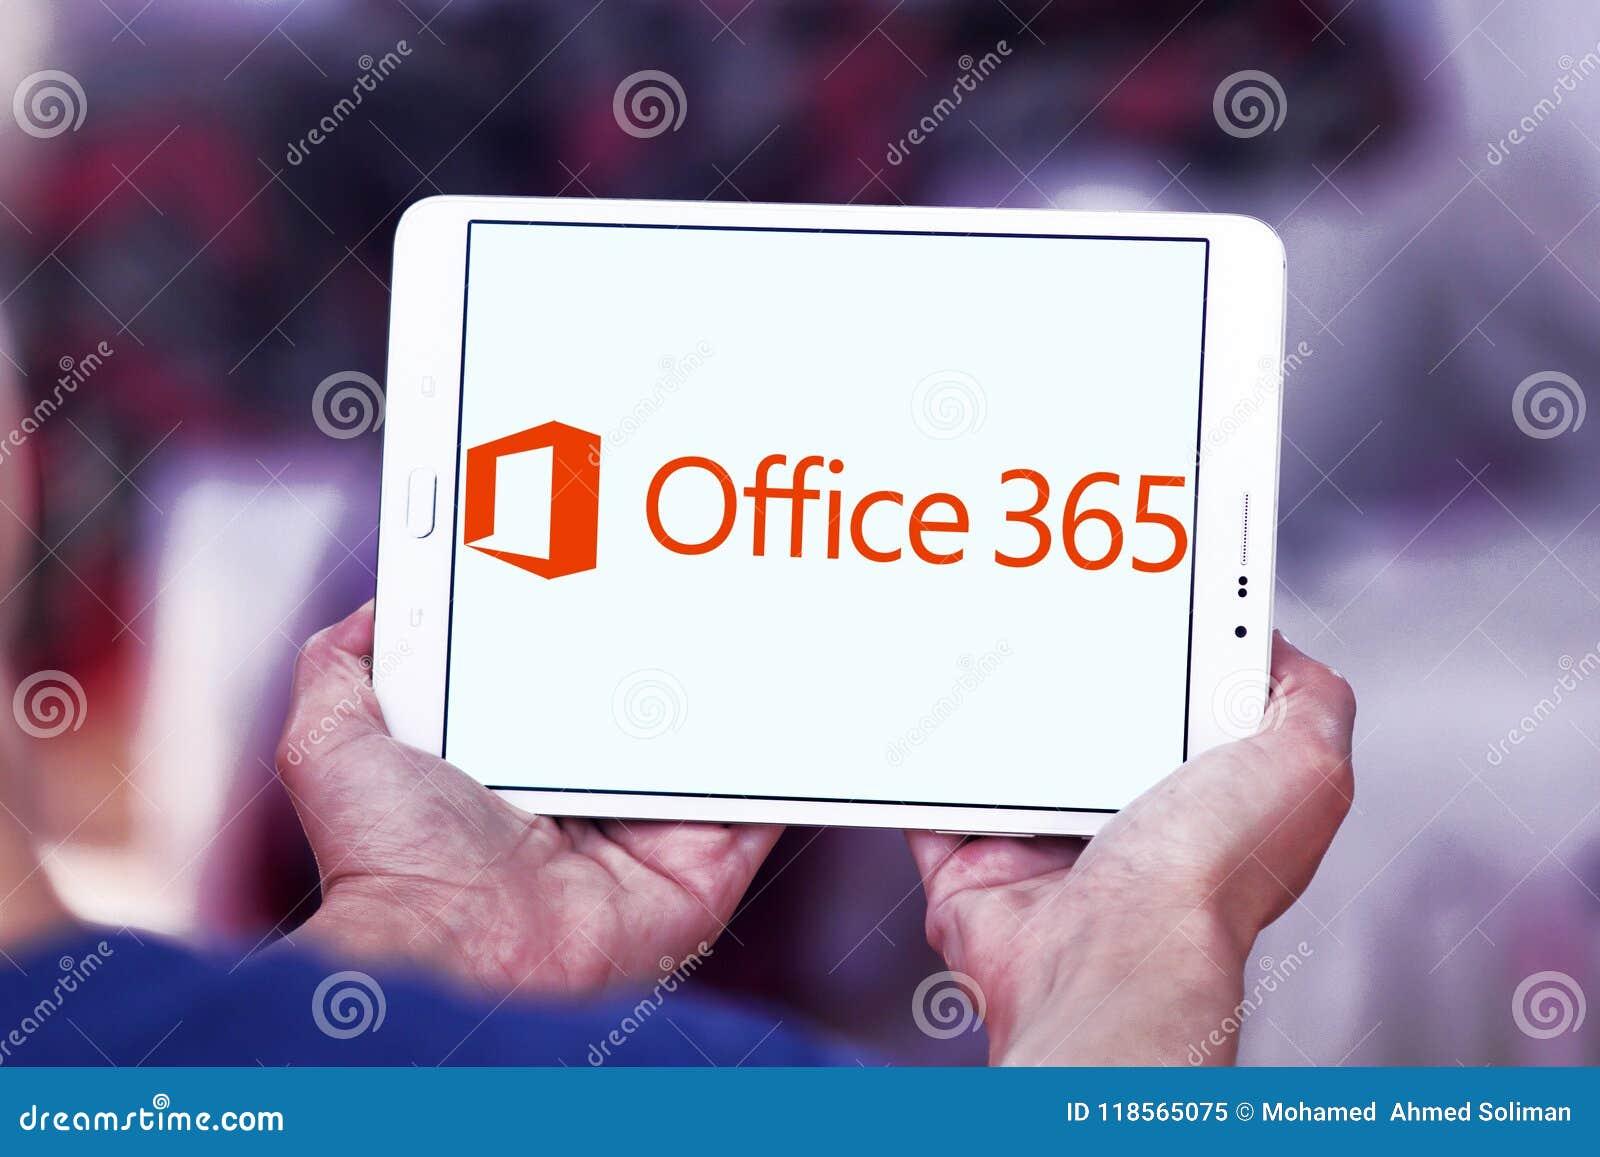 Office 365 logo editorial image  Image of logos, computer - 118565075